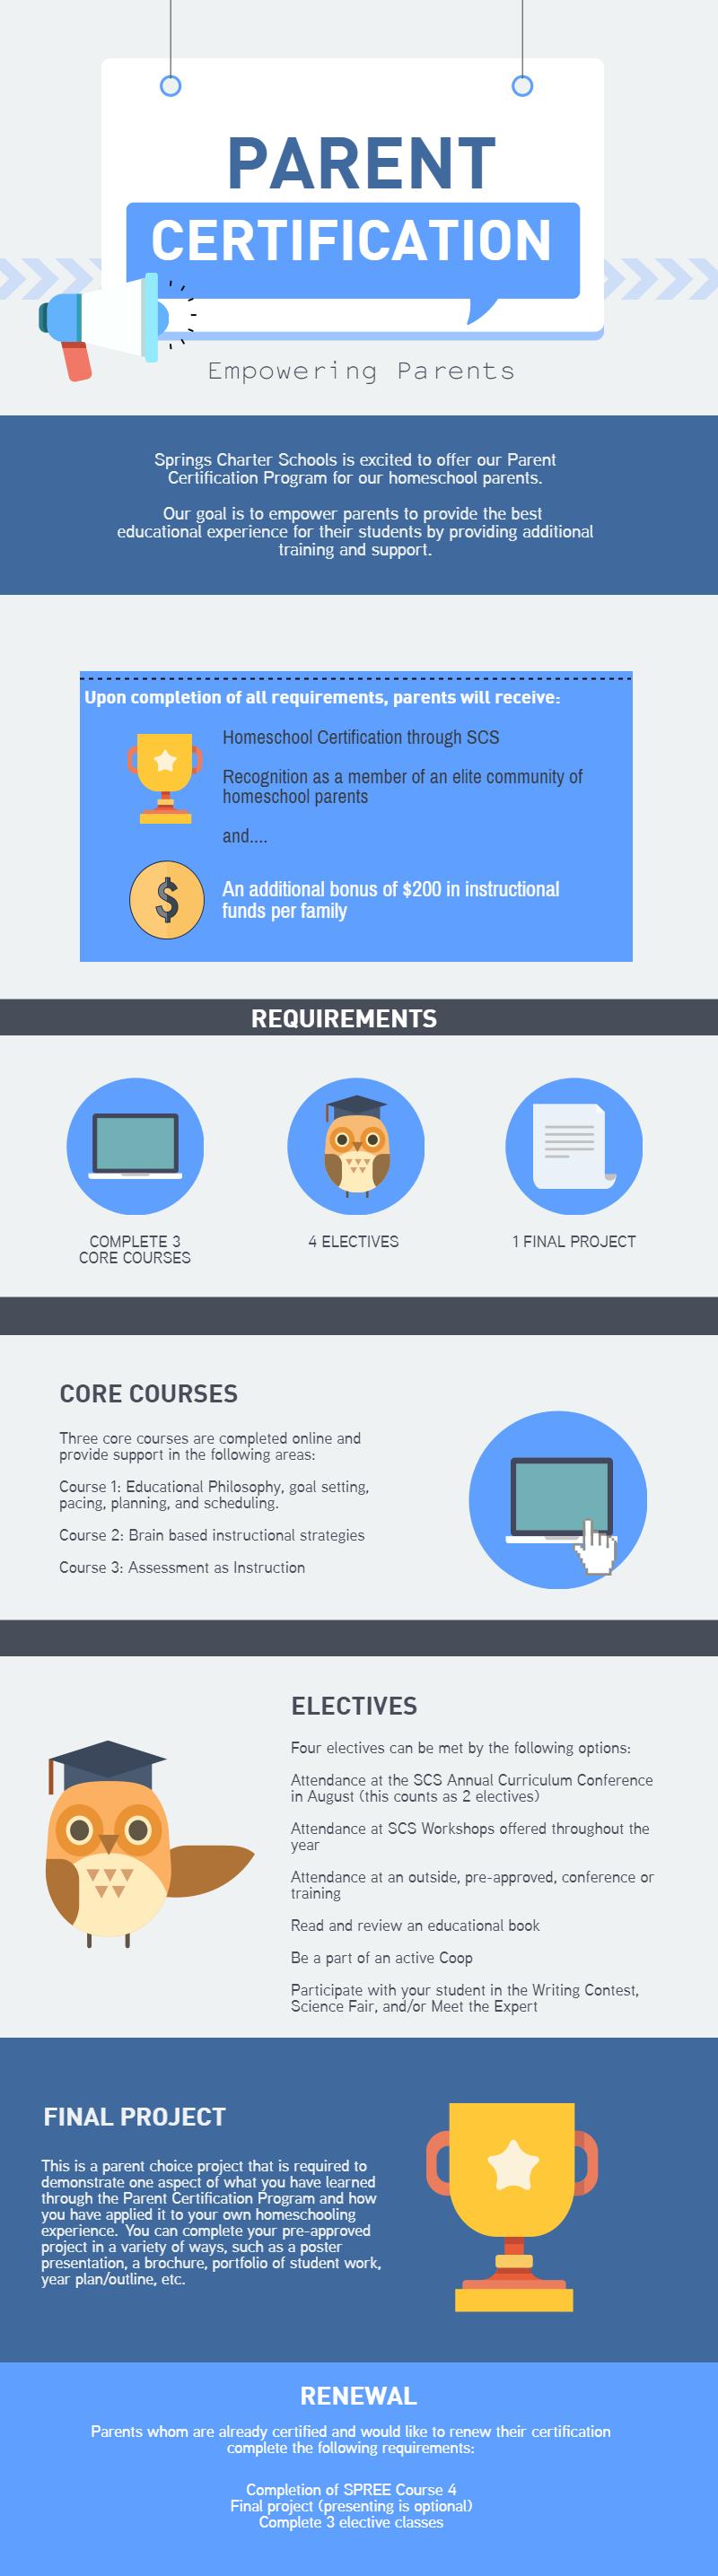 2017 Parent Cert Infographic Long for Website